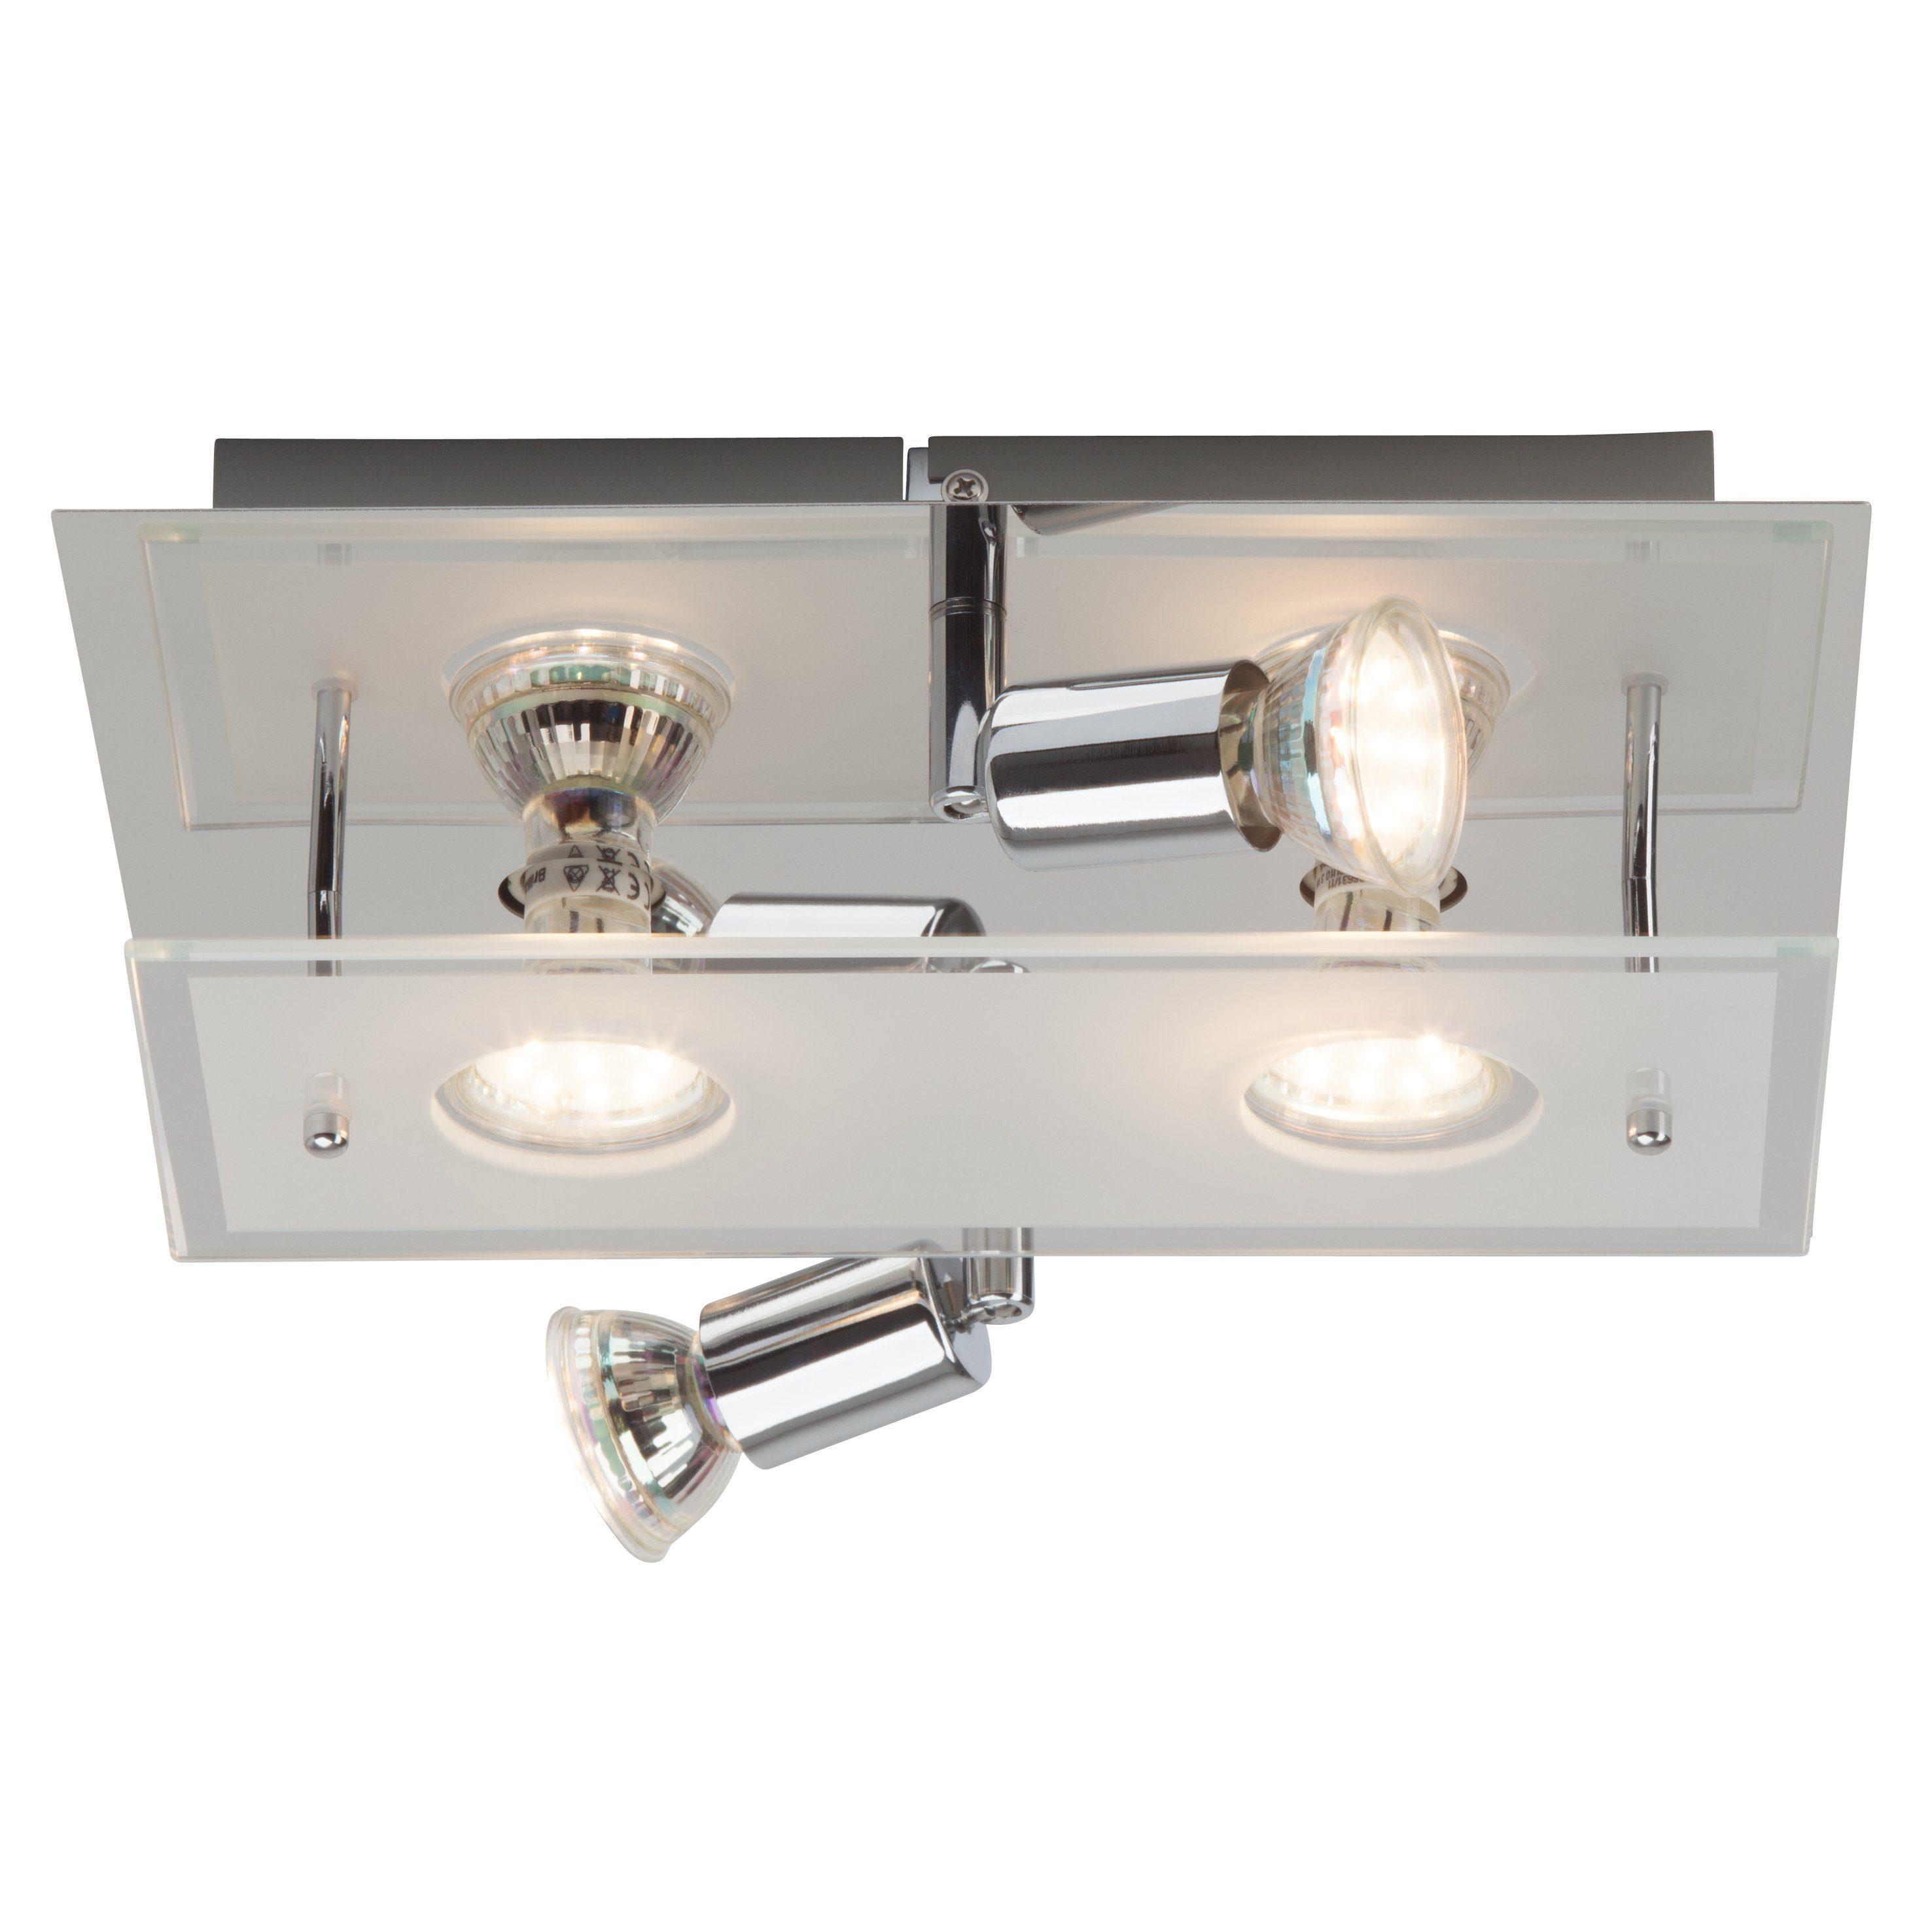 BreLight Virginia LED Deckenleuchte, 4-flammig chrom